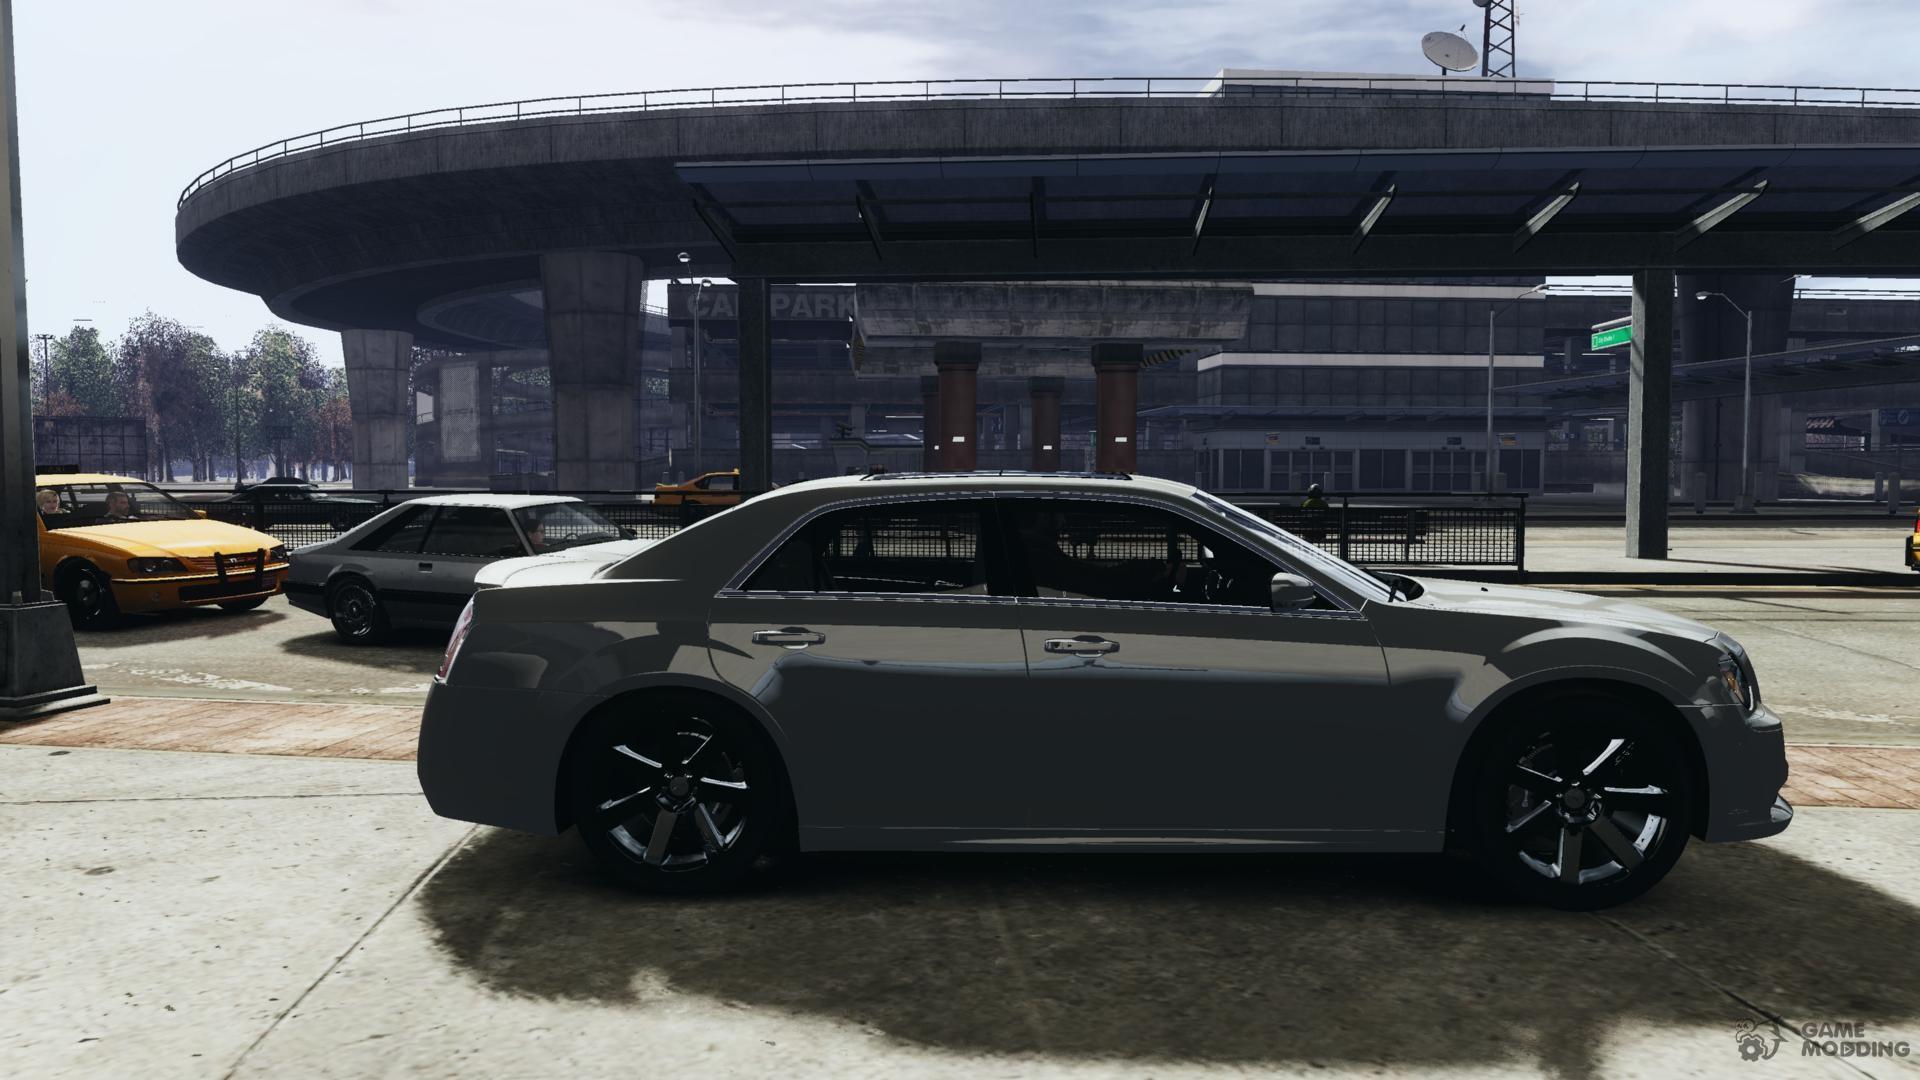 Chrysler 300 SRT8 2012 for GTA 4 on gta 5 mitsubishi eclipse, gta 5 batmobile, gta 5 ferrari 250 gto, gta 5 mitsubishi galant, gta 5 volkswagen passat, gta 5 carbonizzare, gta 5 mitsubishi lancer, gta 5 eagle, gta 5 acura tl, gta 5 shelby mustang, gta 5 nissan 370z, gta 5 nissan gt-r, gta 5 holden commodore, gta 5 porsche 918, gta 5 jaguar x-type, gta 5 chevy malibu, gta 5 nissan 240sx, gta 5 ford bronco, gta 5 hennessey venom gt, gta 5 acura nsx,